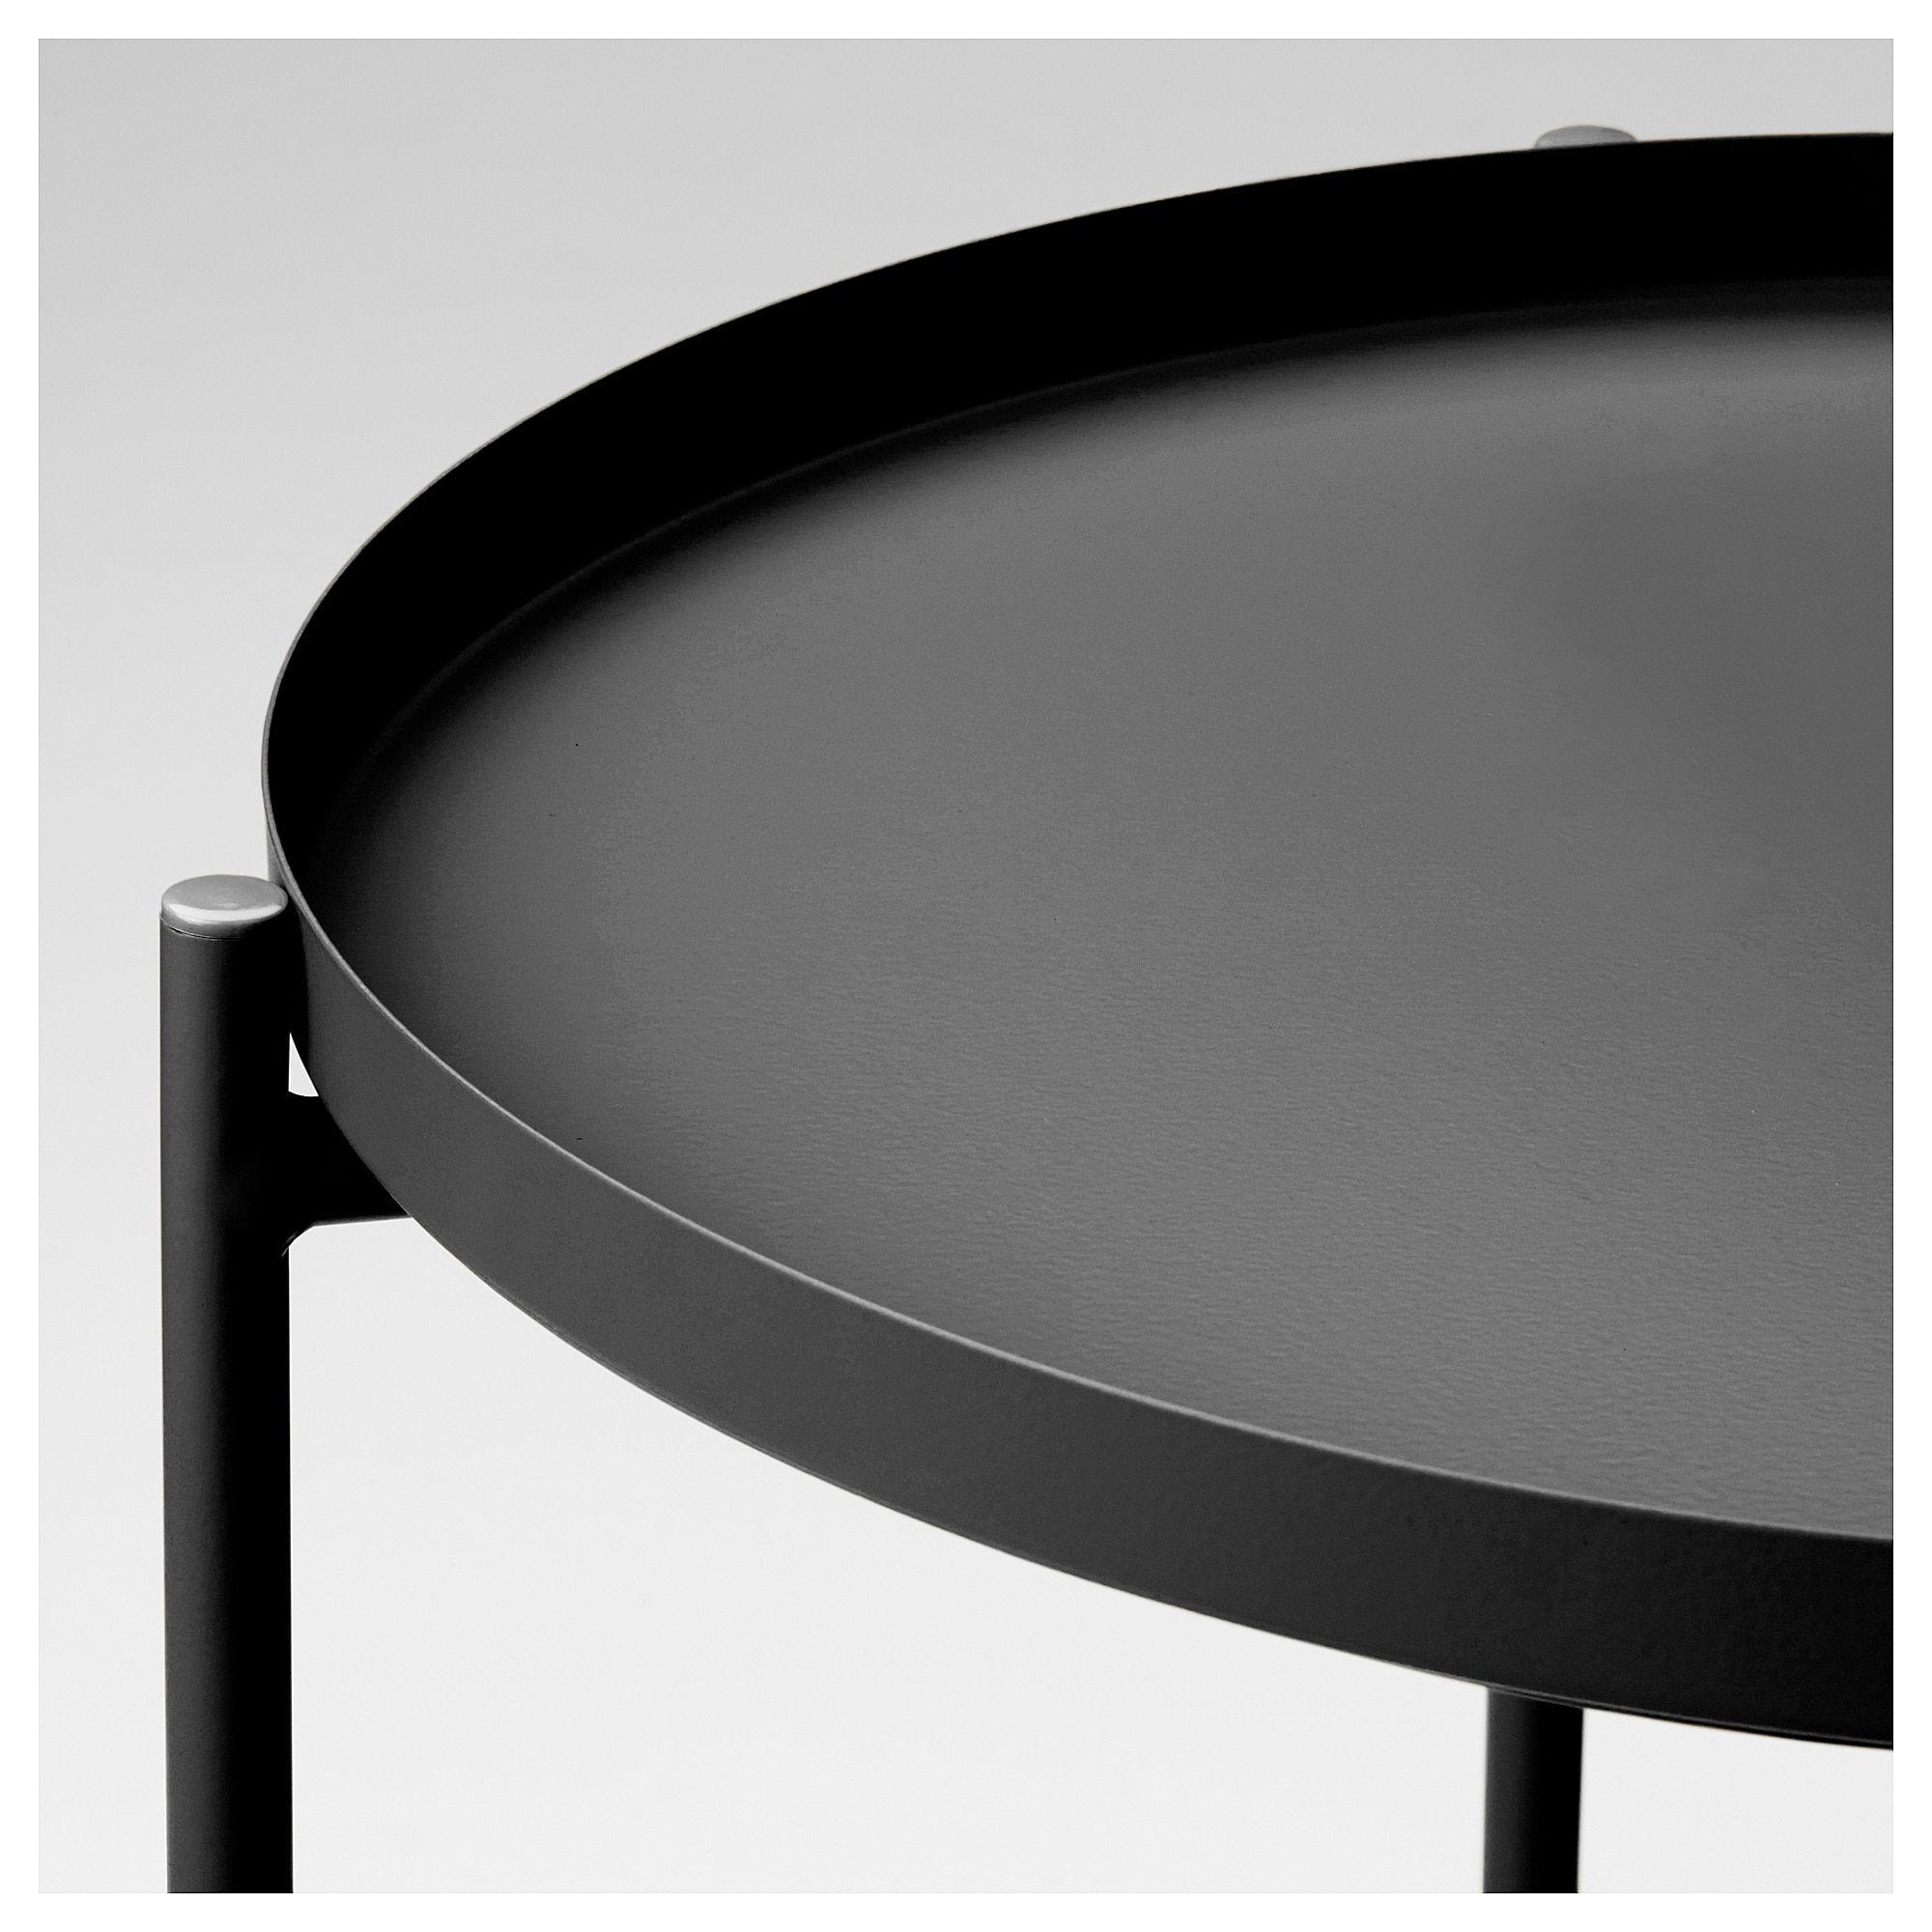 Gladom Ikea Tray Table Ikea Tray Table Round Black Coffee Table [ 2000 x 2000 Pixel ]